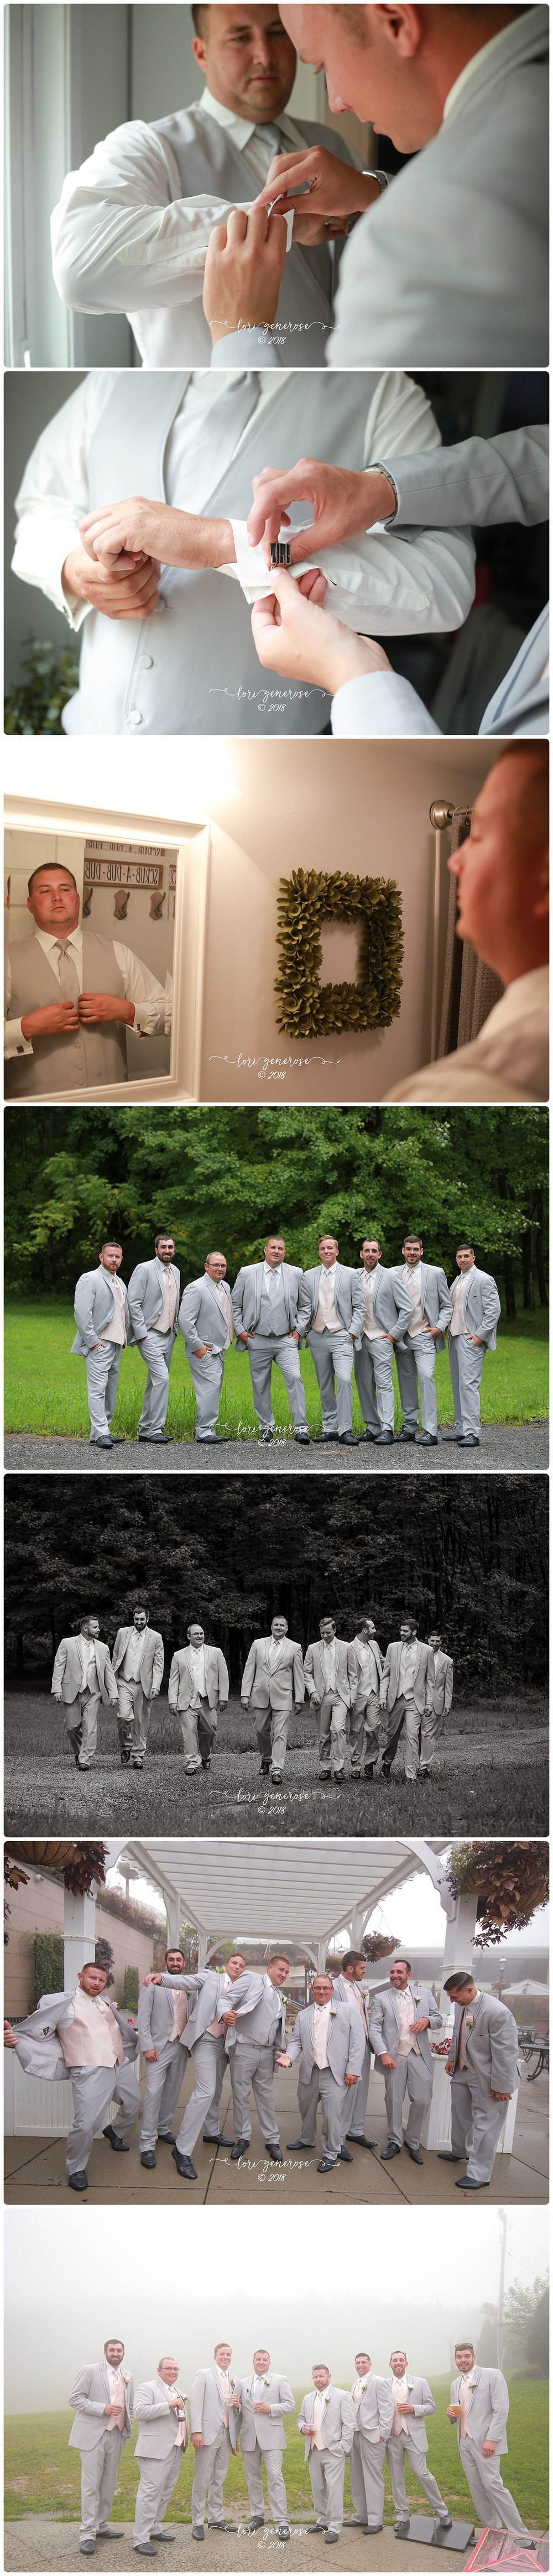 lgphotographylorigenerosebluemountainresortweddingpalmertonpagroomgettingreadydetailsgroomsmen.jpg